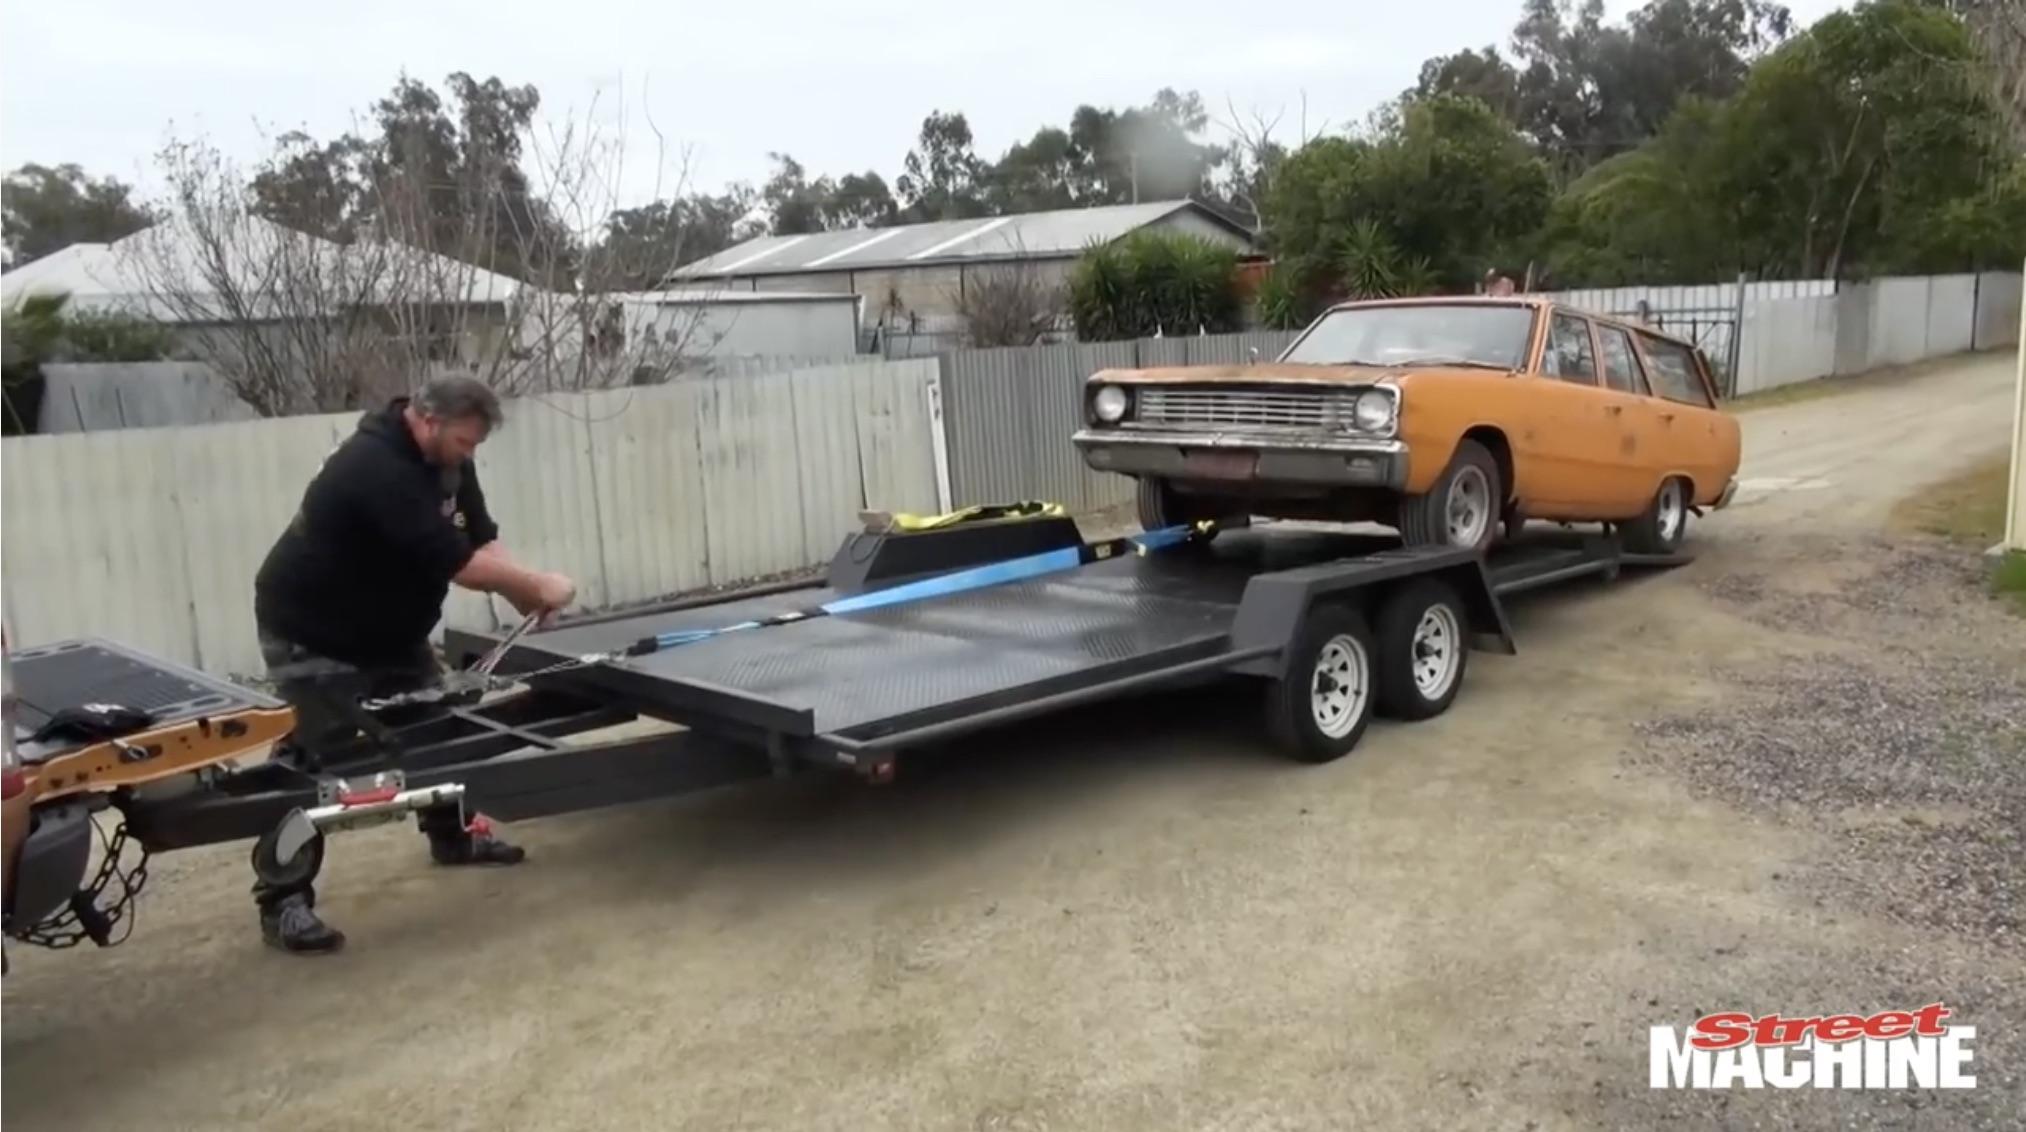 From Rust To Righetous: Street Machine's Rustoleum Valiant Wagon Project Kicks Off!